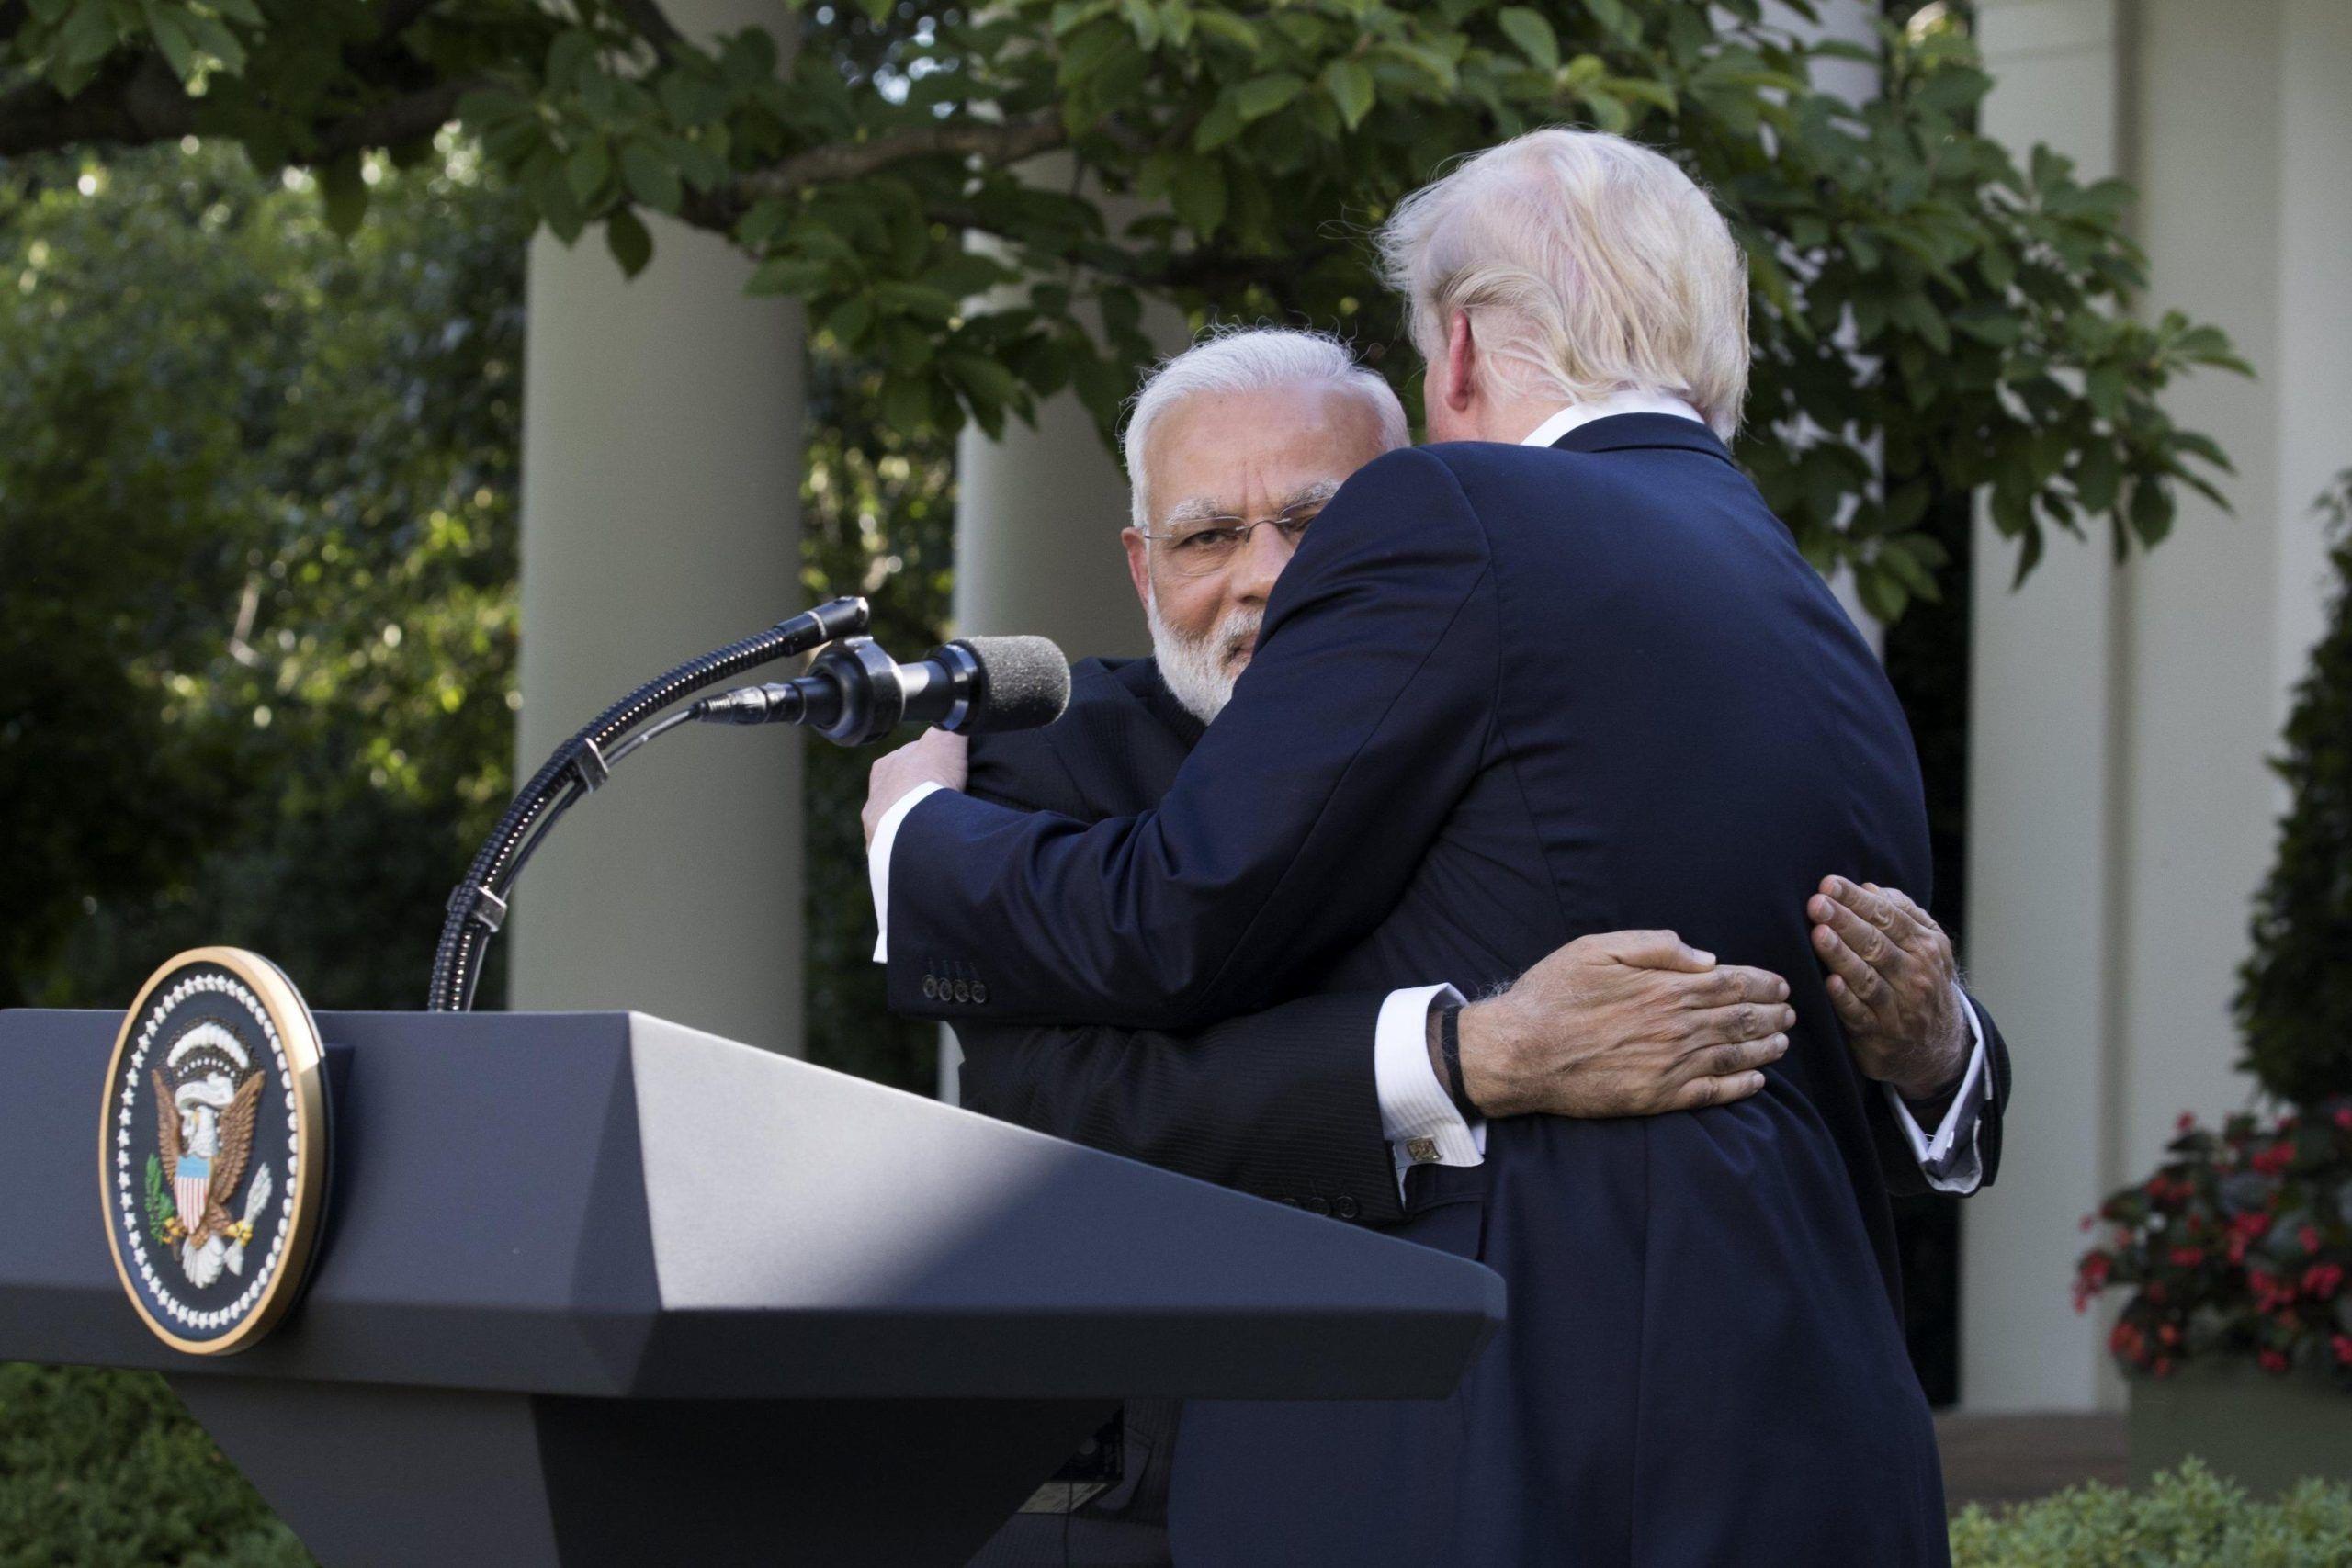 US President Donald J. Trump hosts the Indian Prime Minister Narendra Modi at the White House